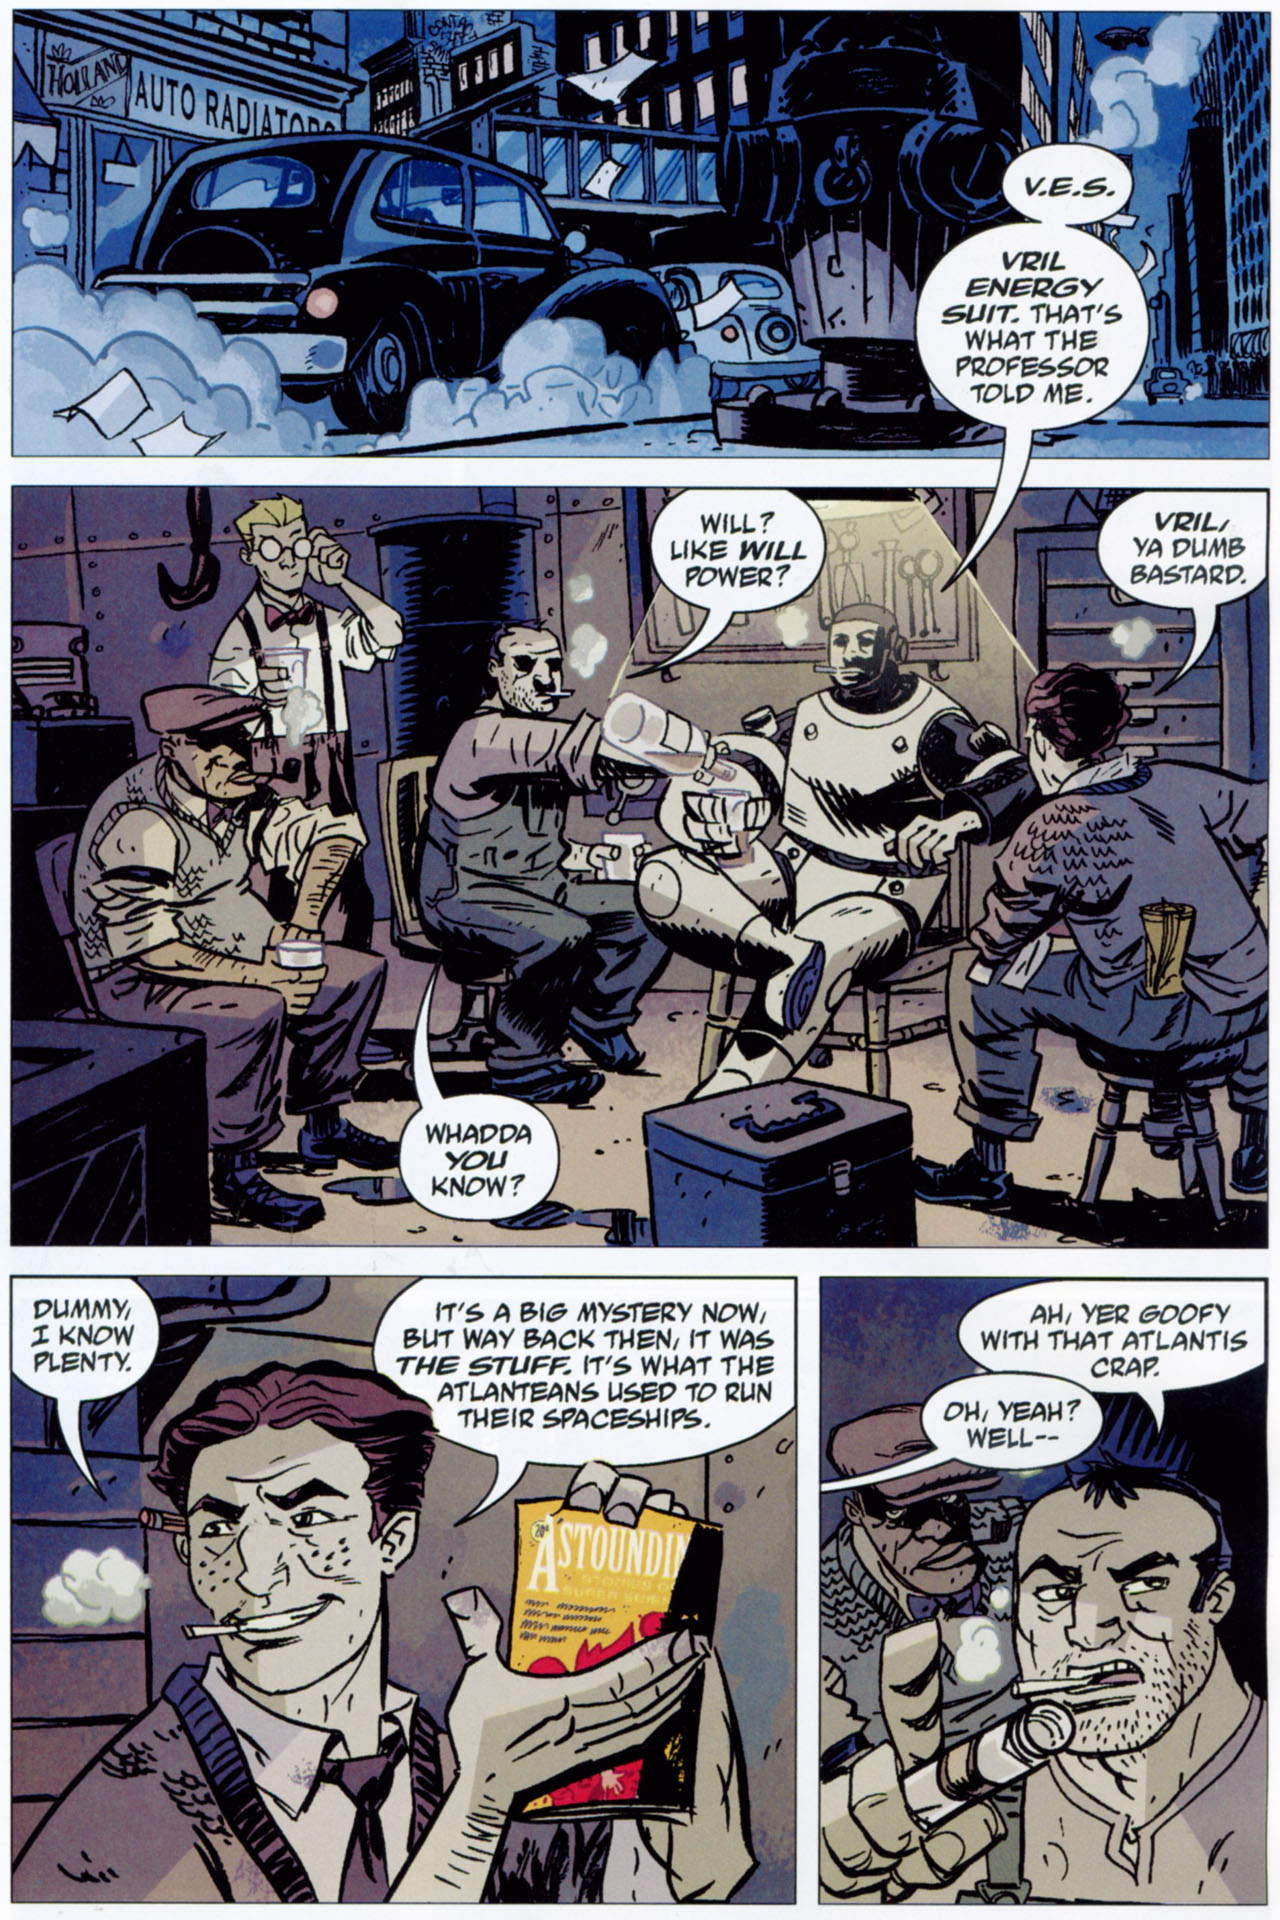 Read online Lobster Johnson: The Iron Prometheus comic -  Issue #1 - 22